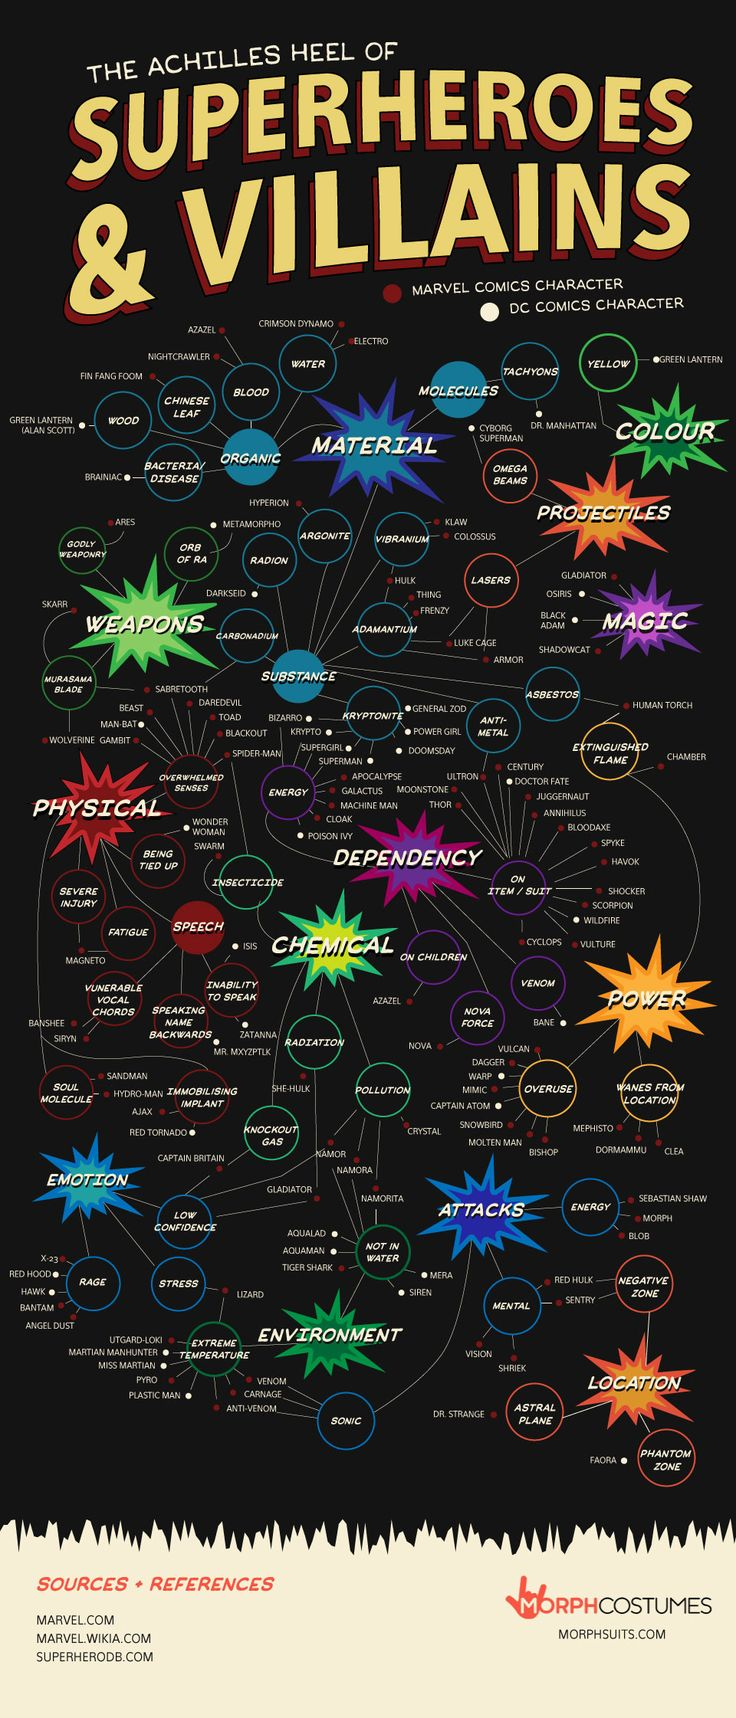 Infographic -> The Achilles Heel of Superheroes and Villain infografia infografica